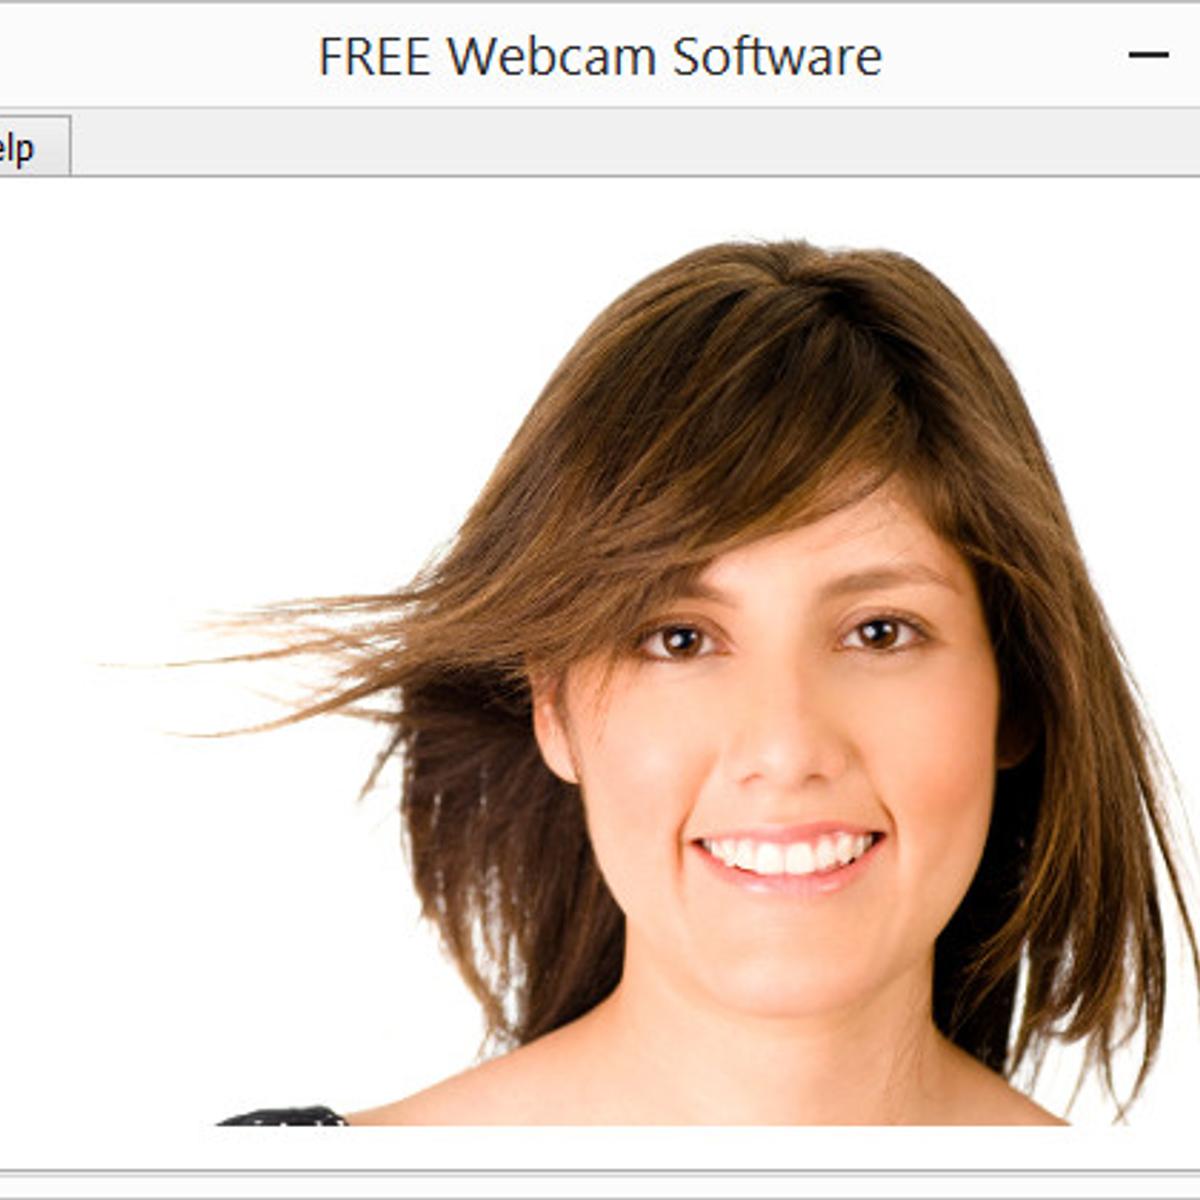 Webcam Viewer Alternatives and Similar Software